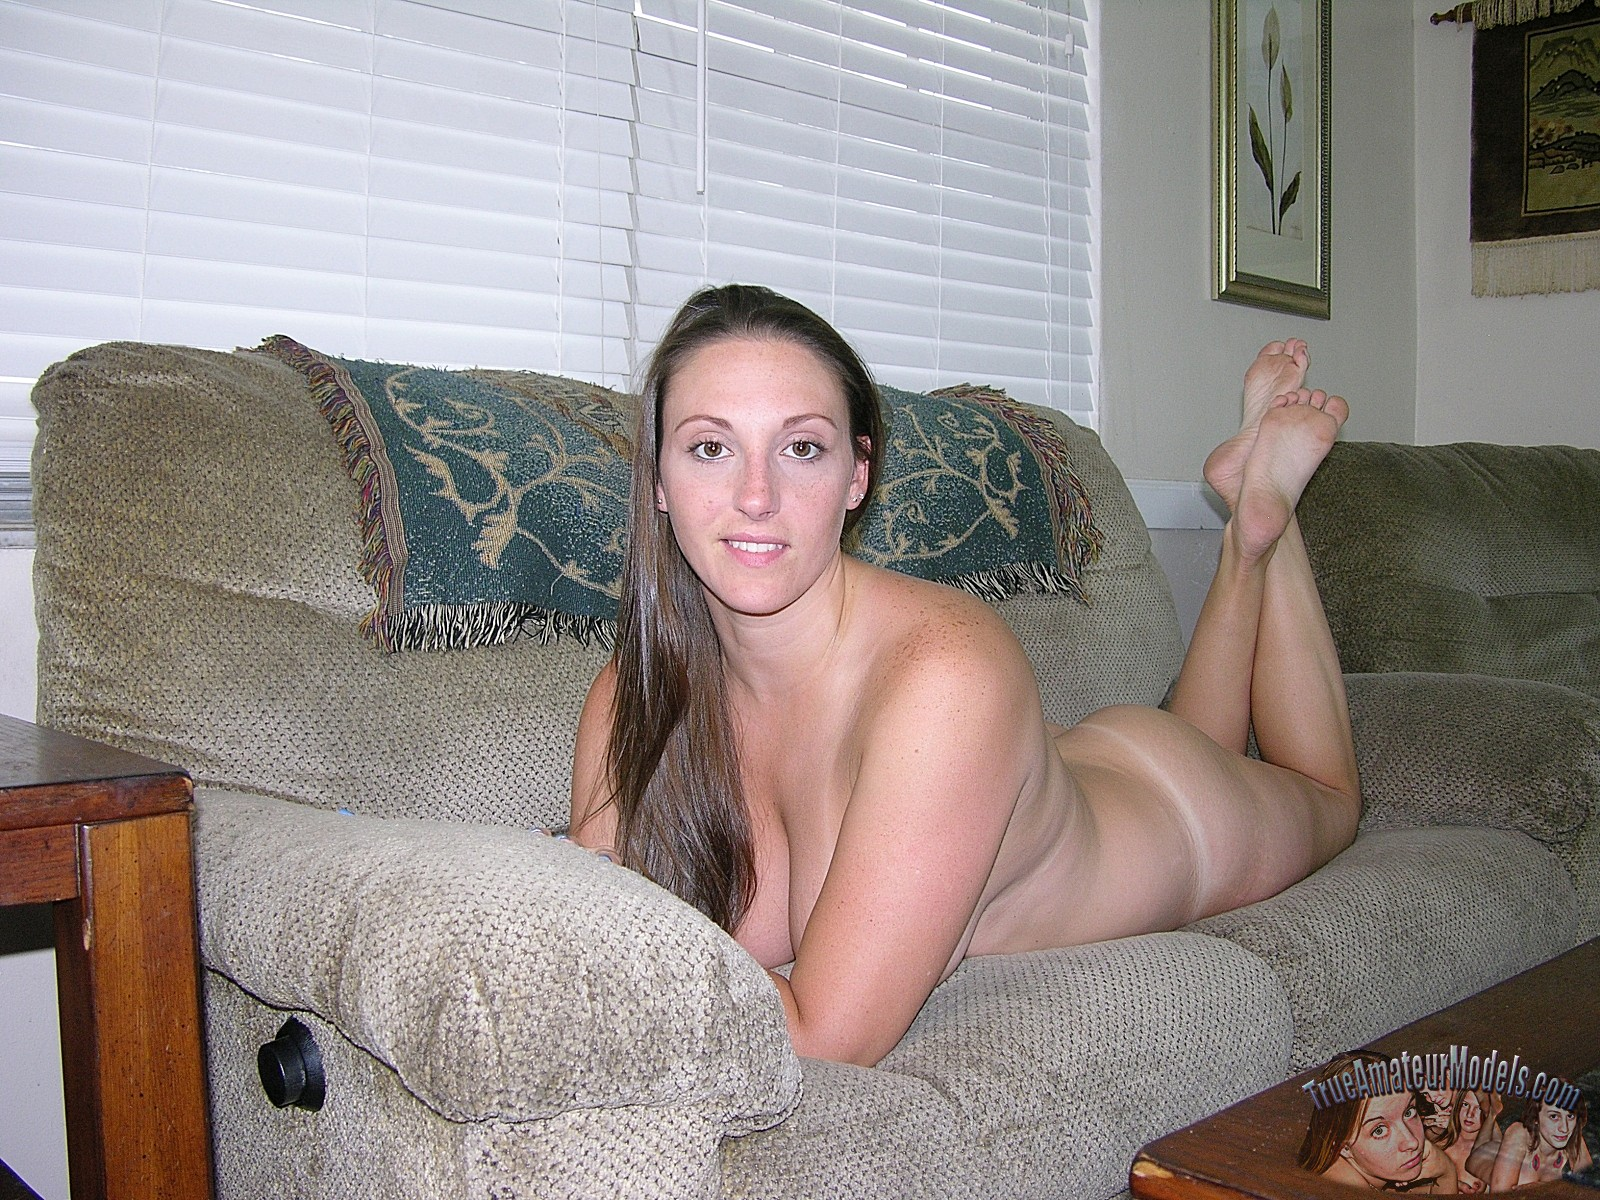 Beautiful girl gf naked